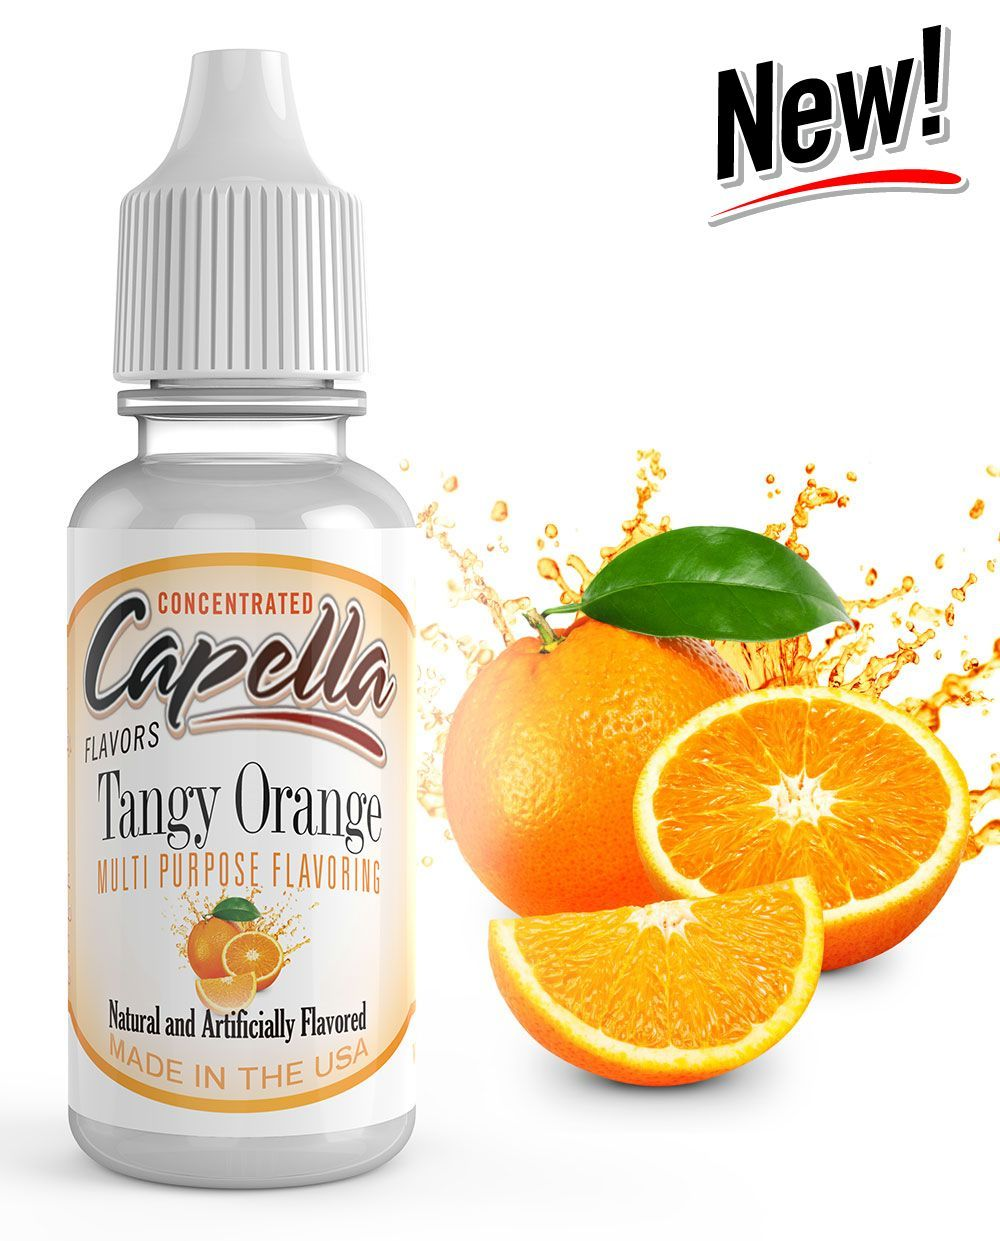 ŠŤAVNATÝ POMERANČ / Tangy Orange - Aroma Capella 13 ml